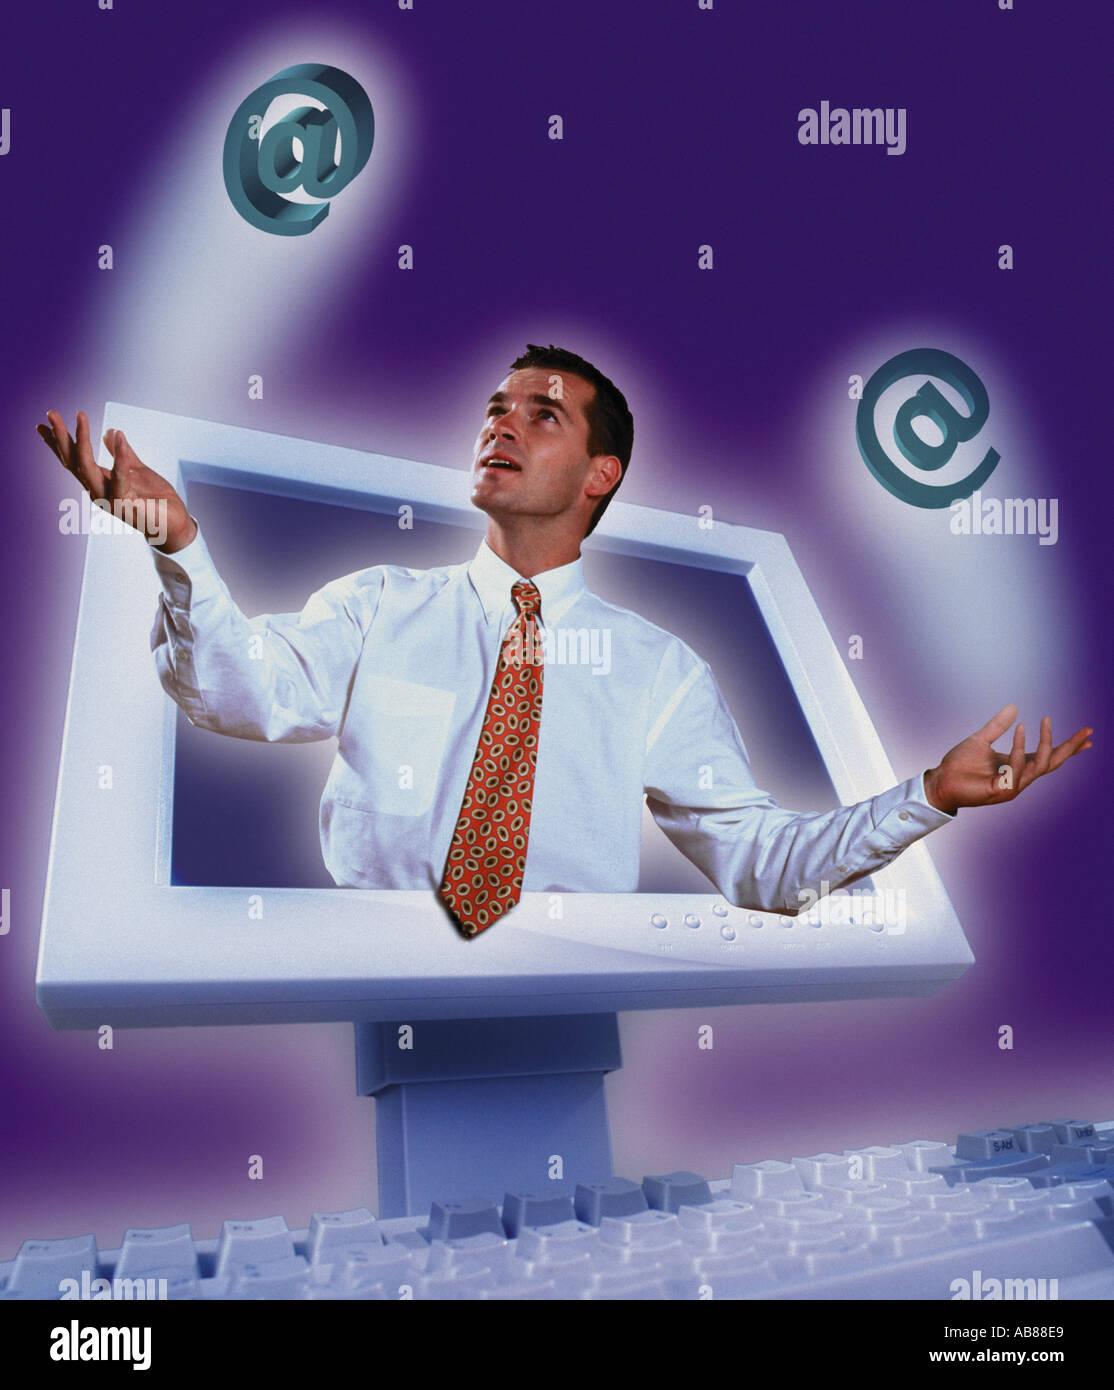 Web access - Stock Image